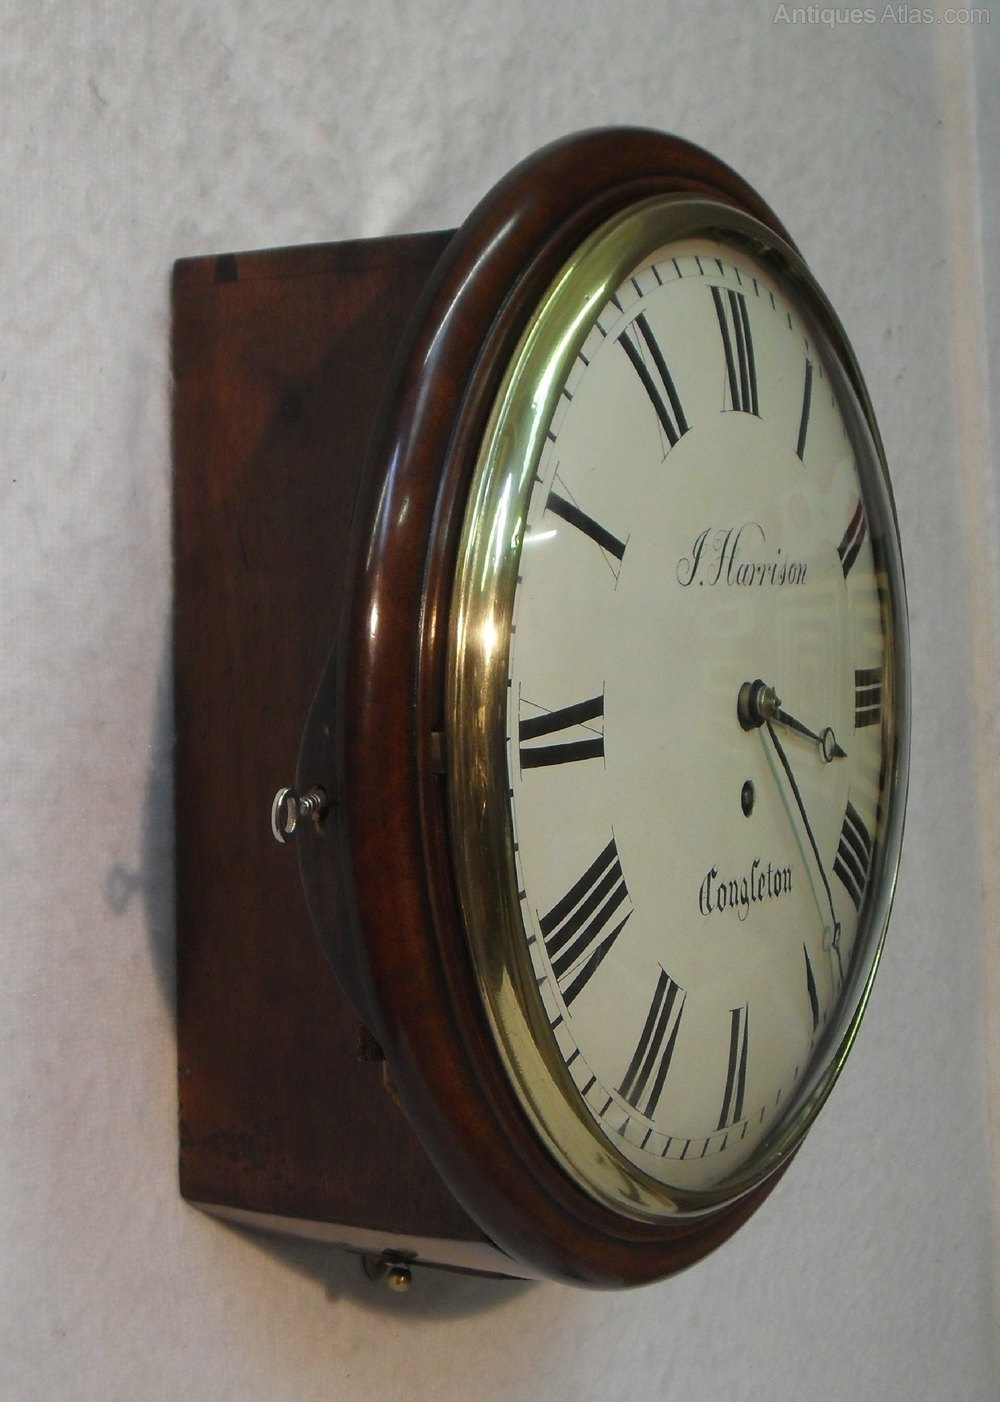 Antiques Atlas English Wall Clock